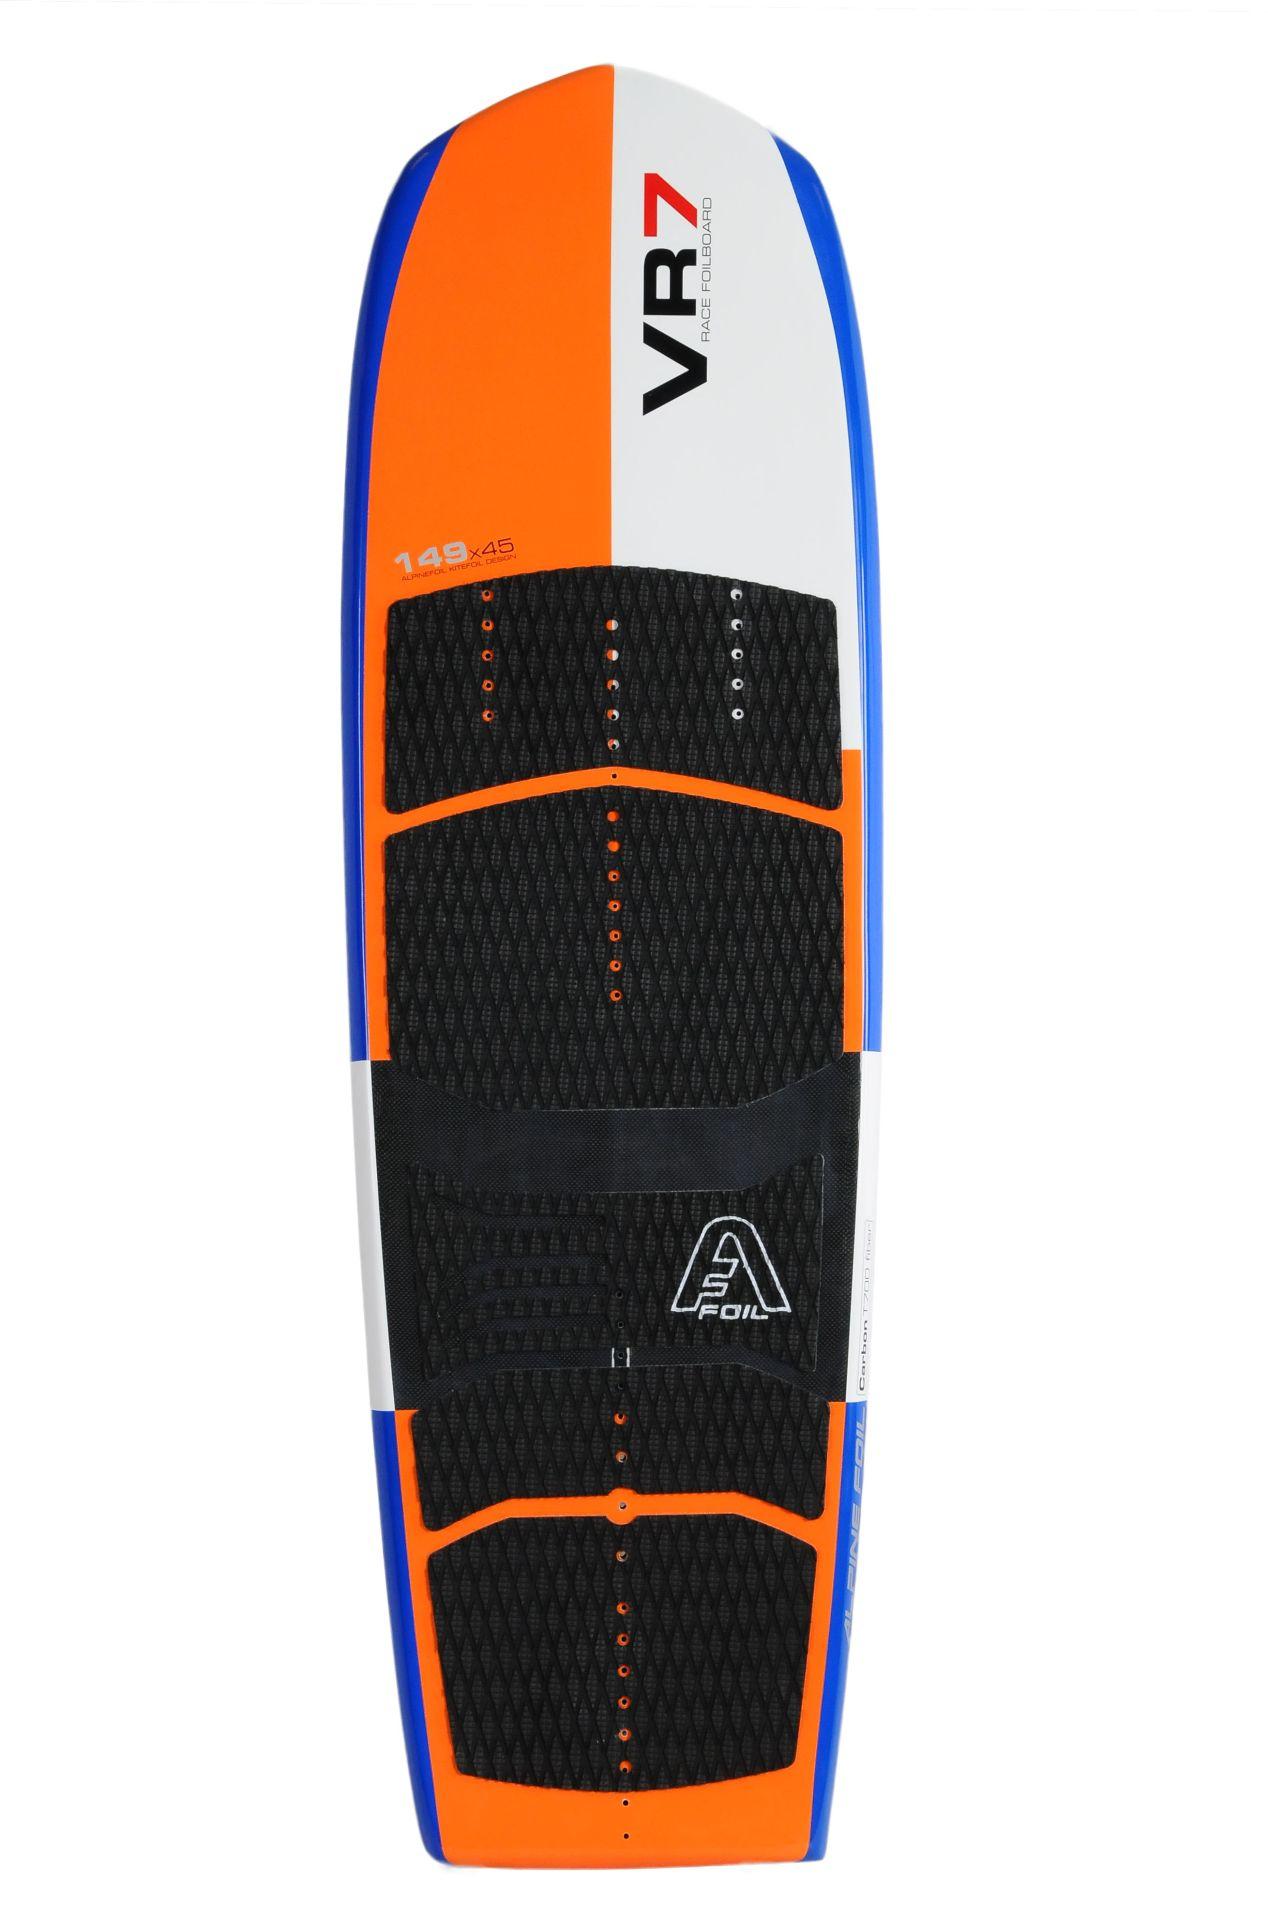 Kitefoil foilboard alpinefoil vr7 1